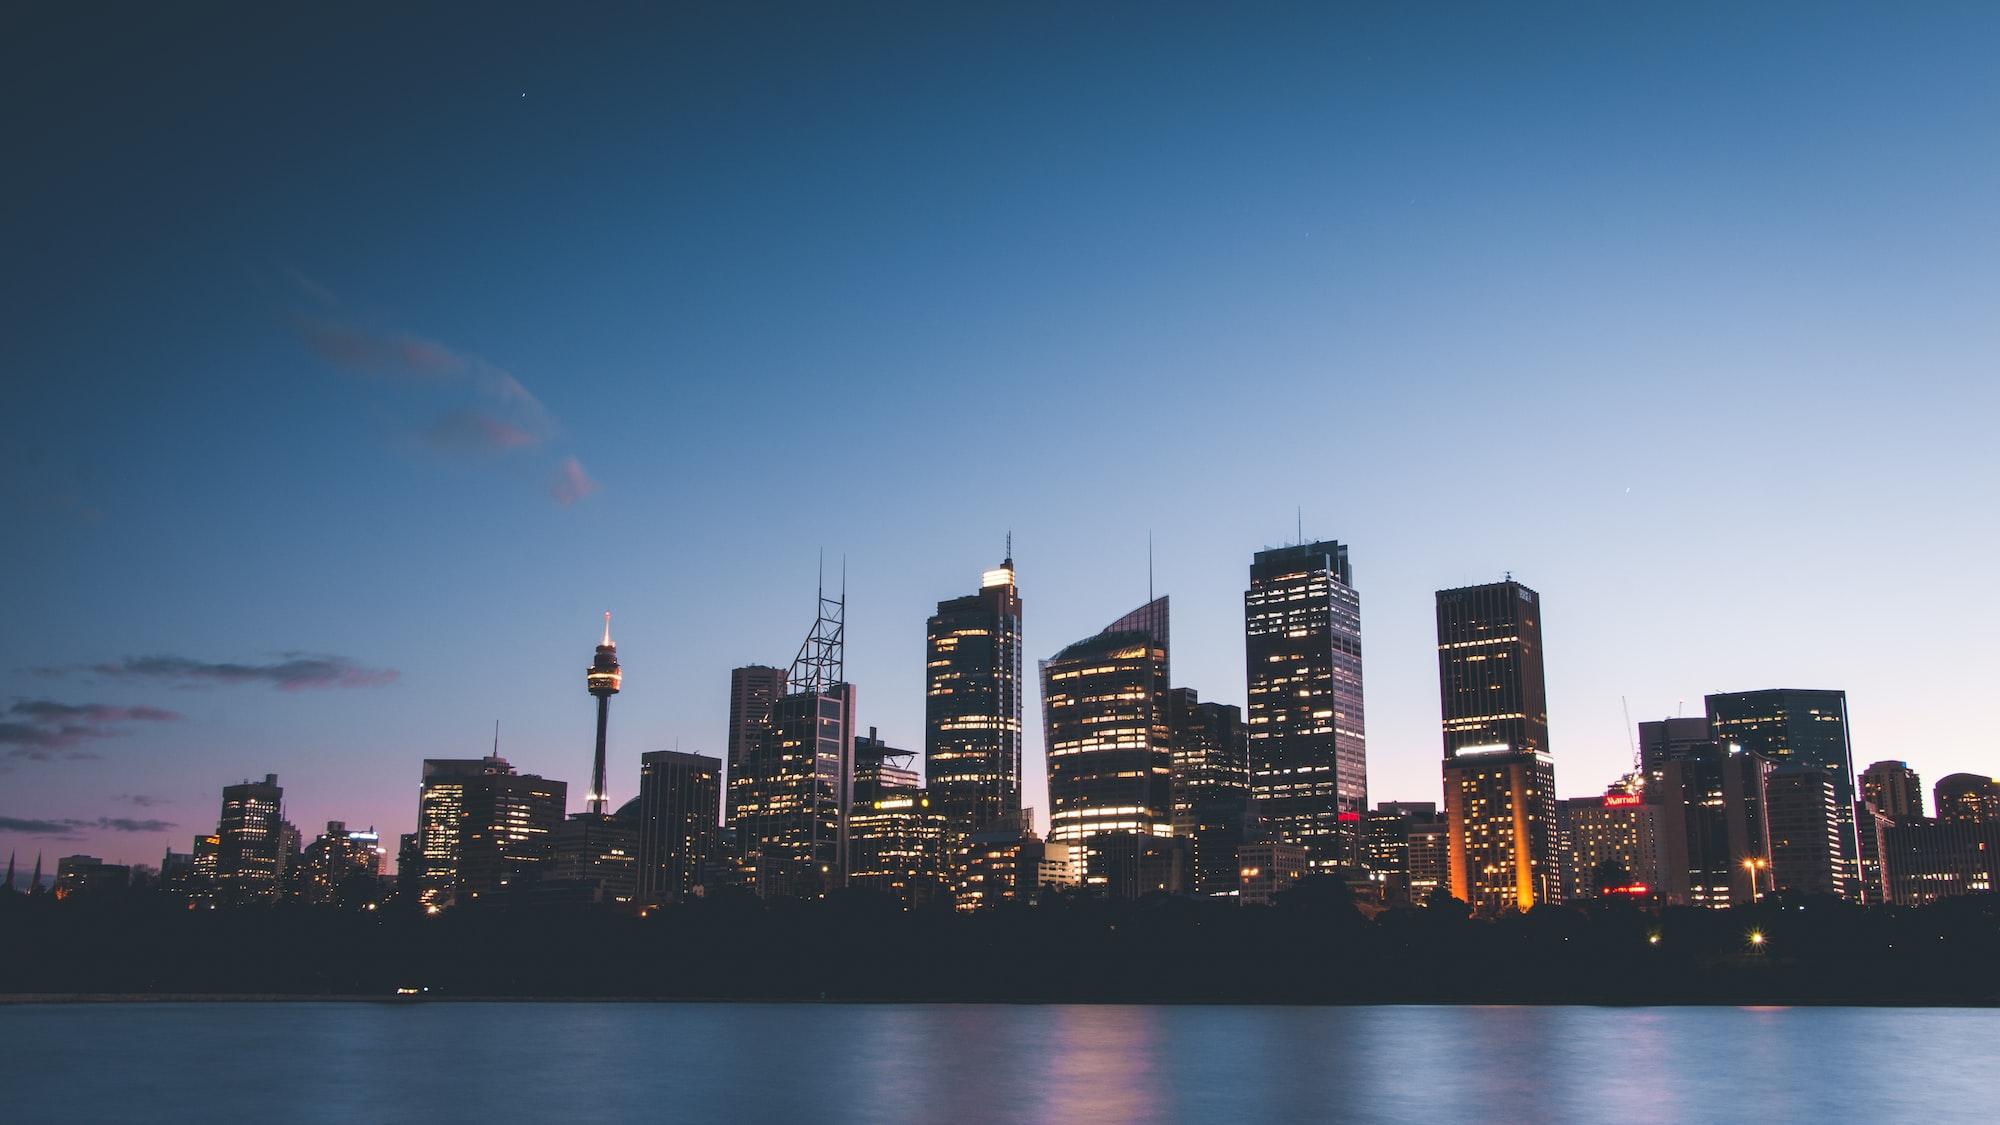 The 18th Annual AVCJ Australia and New Zealand Forum